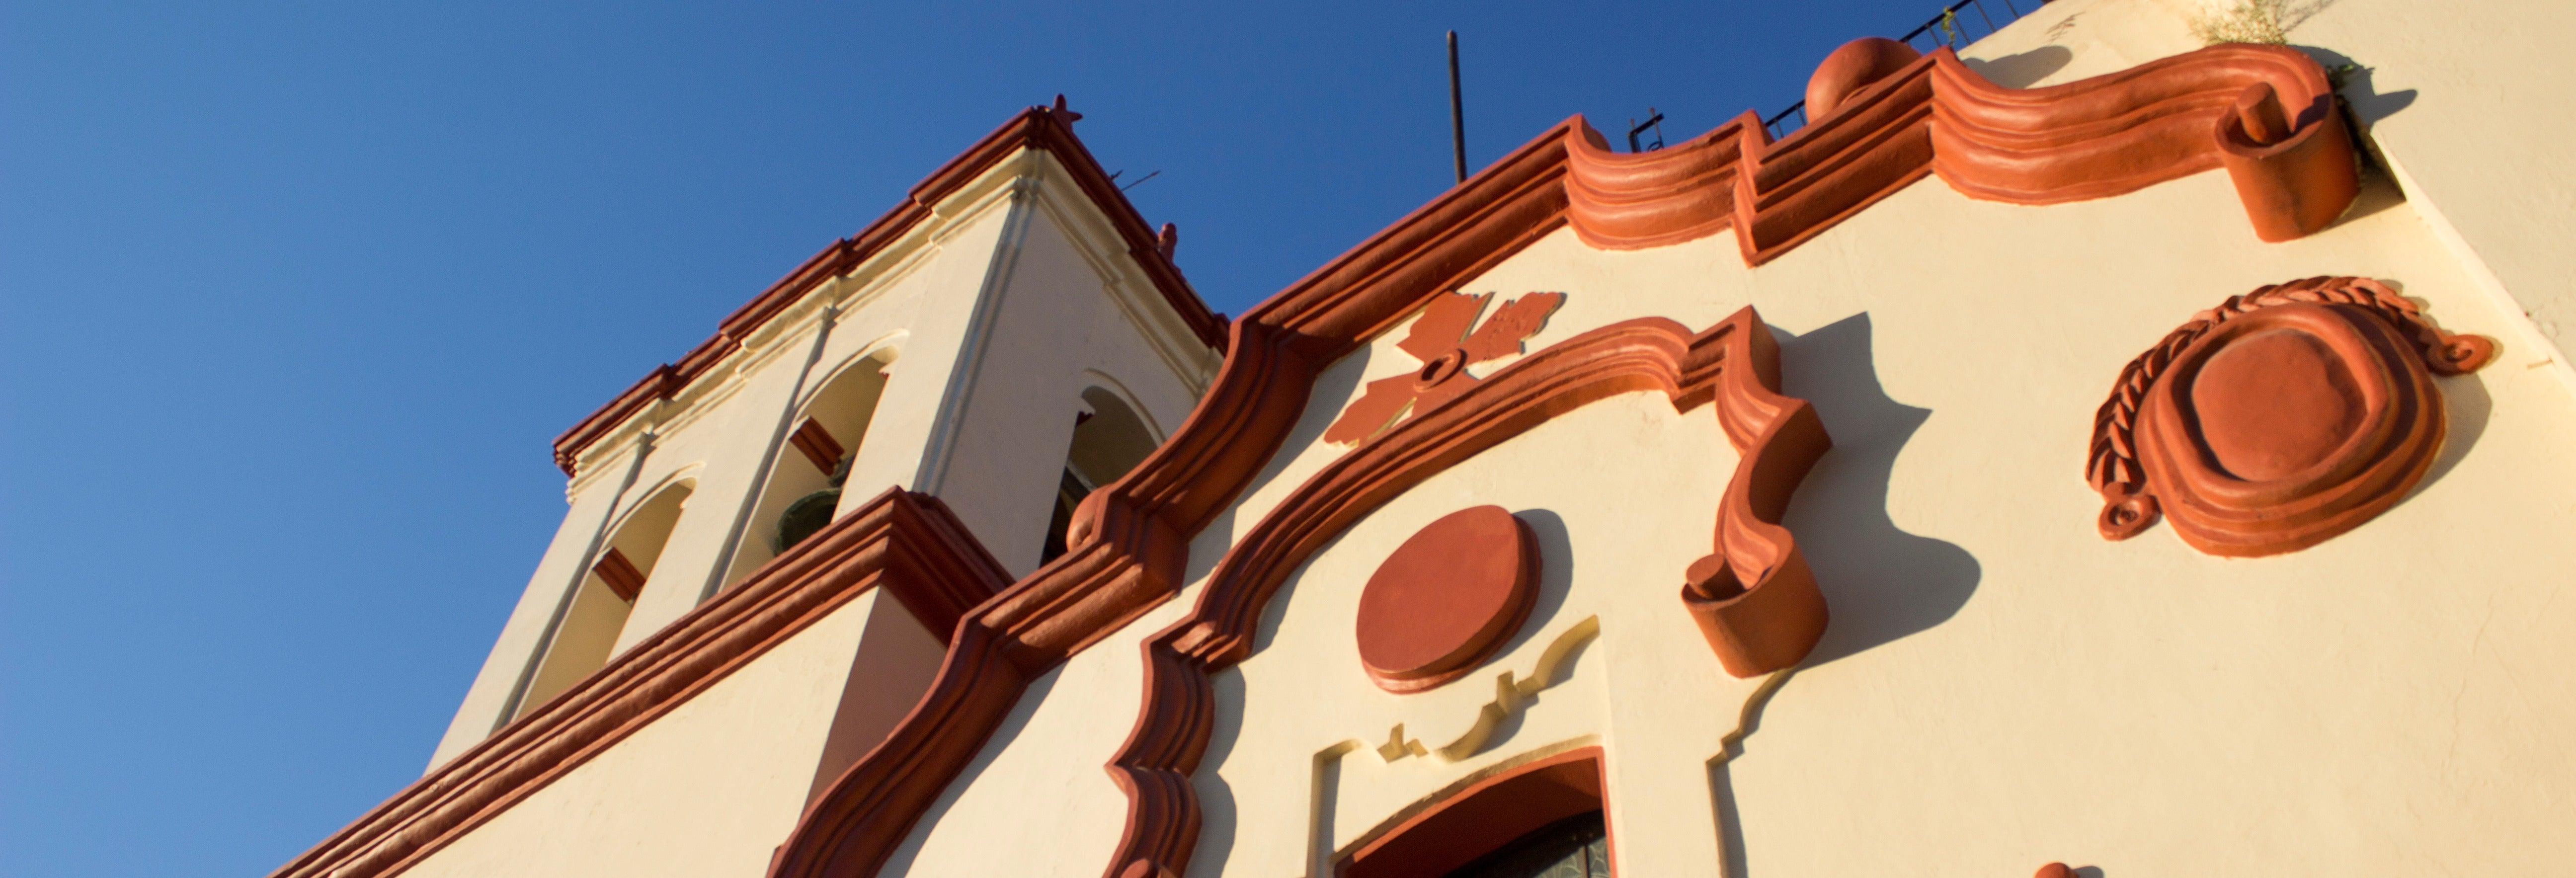 Excursión a Santiago desde Monterrey